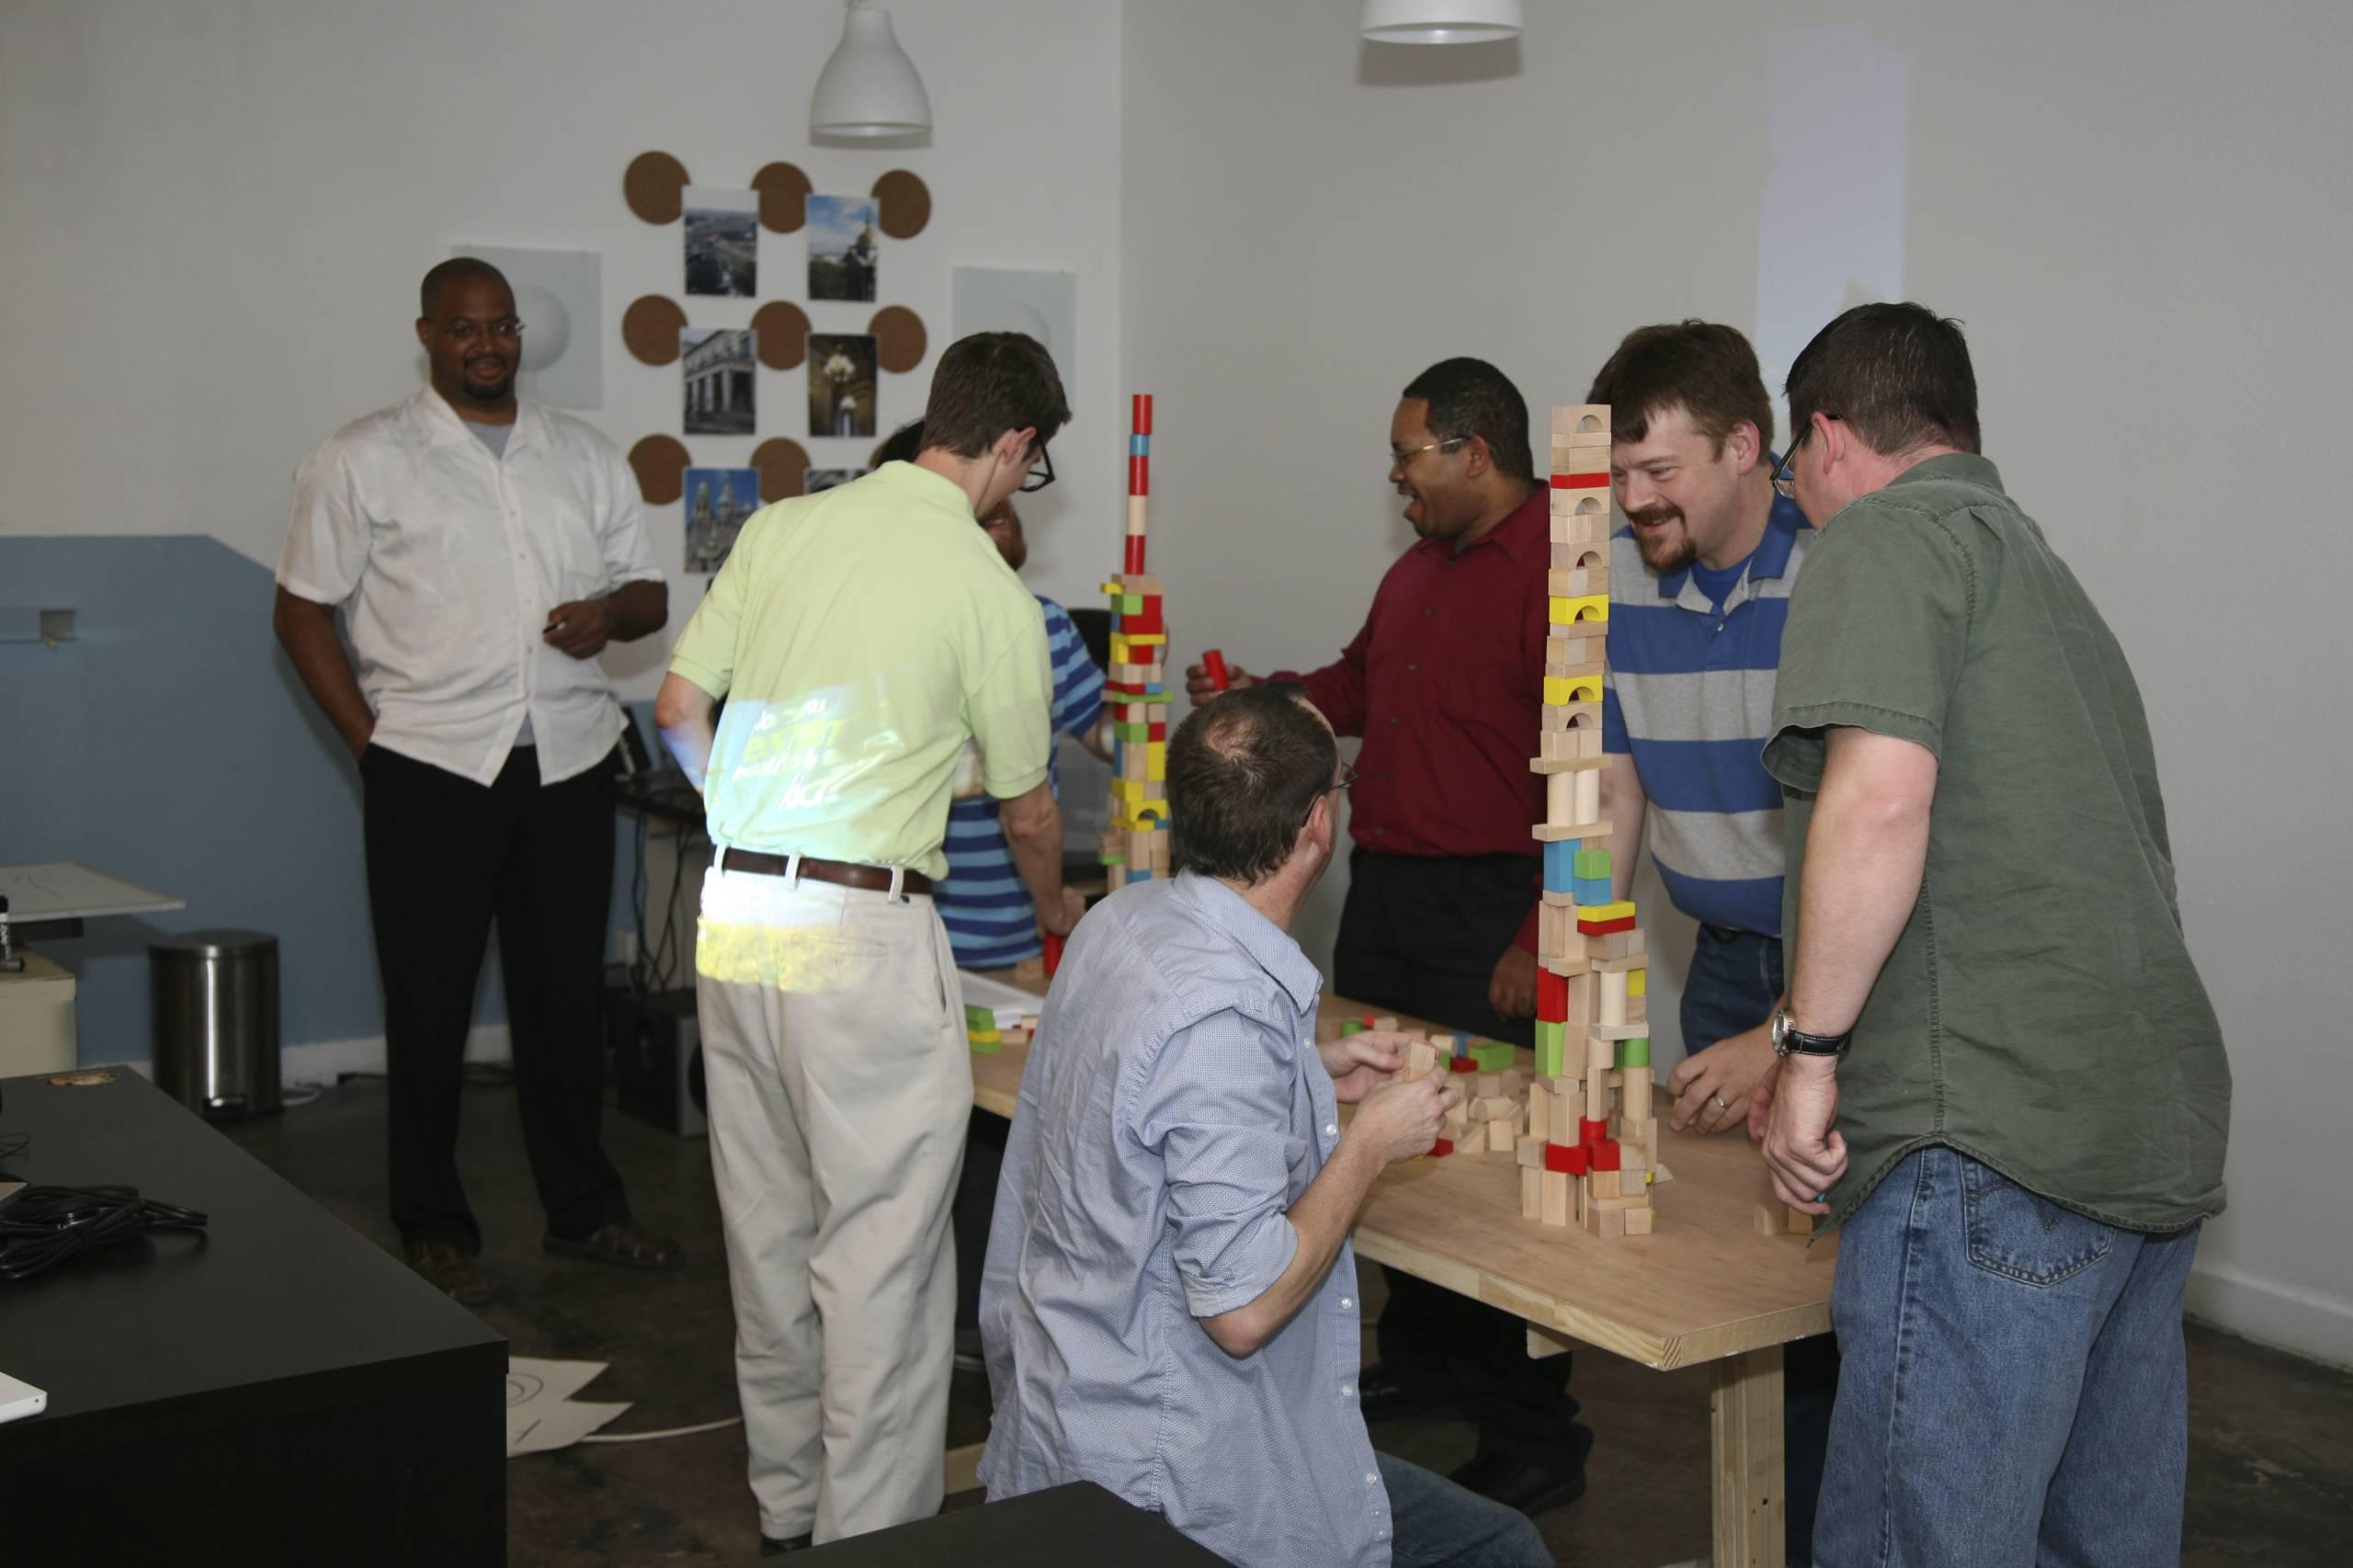 How Can I Improve My Marketing Team's Creative Thinking?